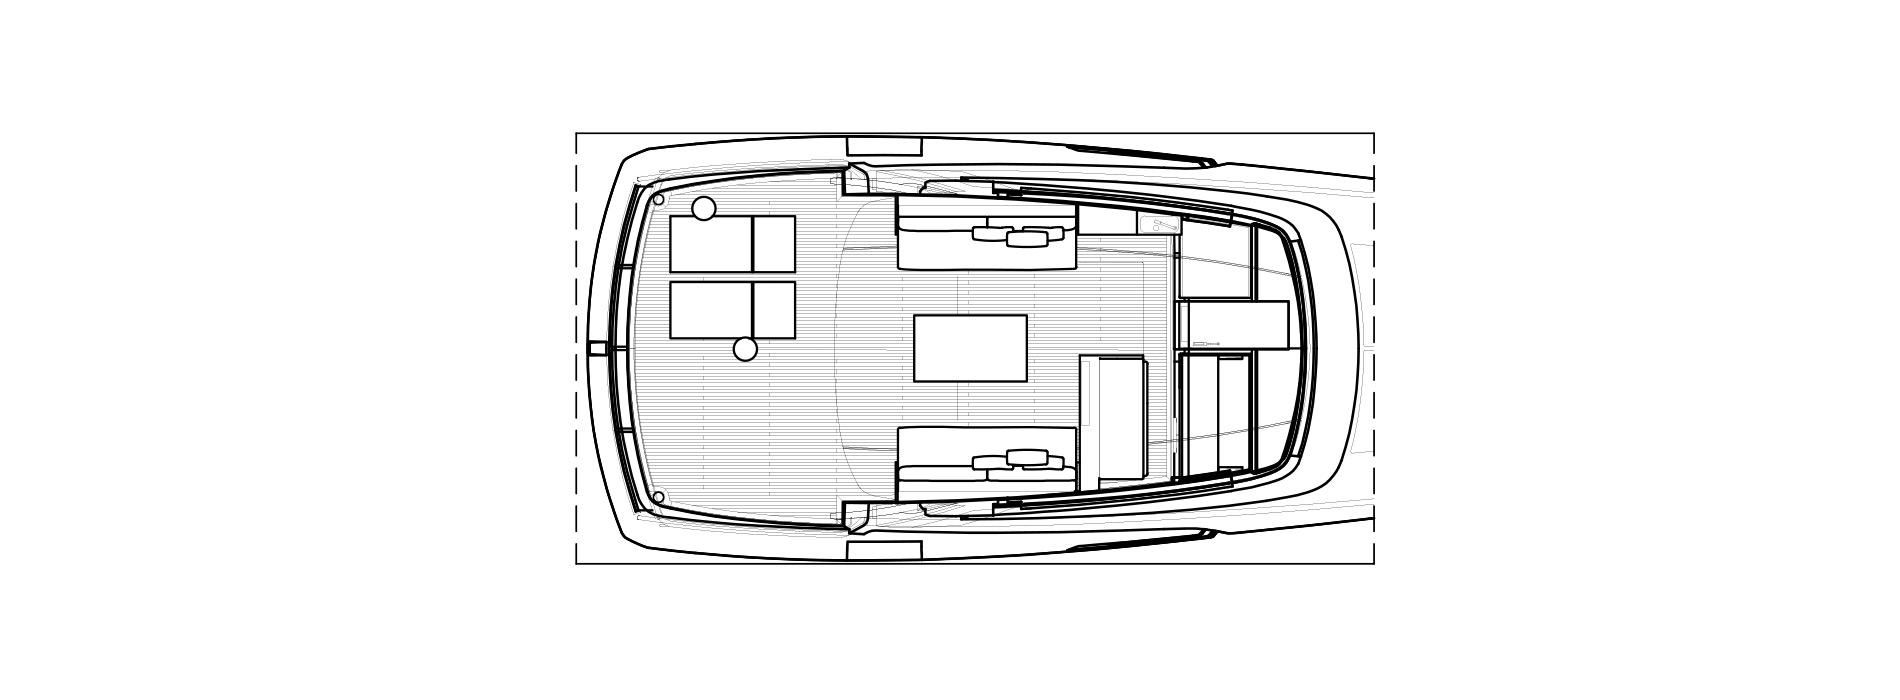 Sanlorenzo Yachts SX88 Detalles Versione Lissoni